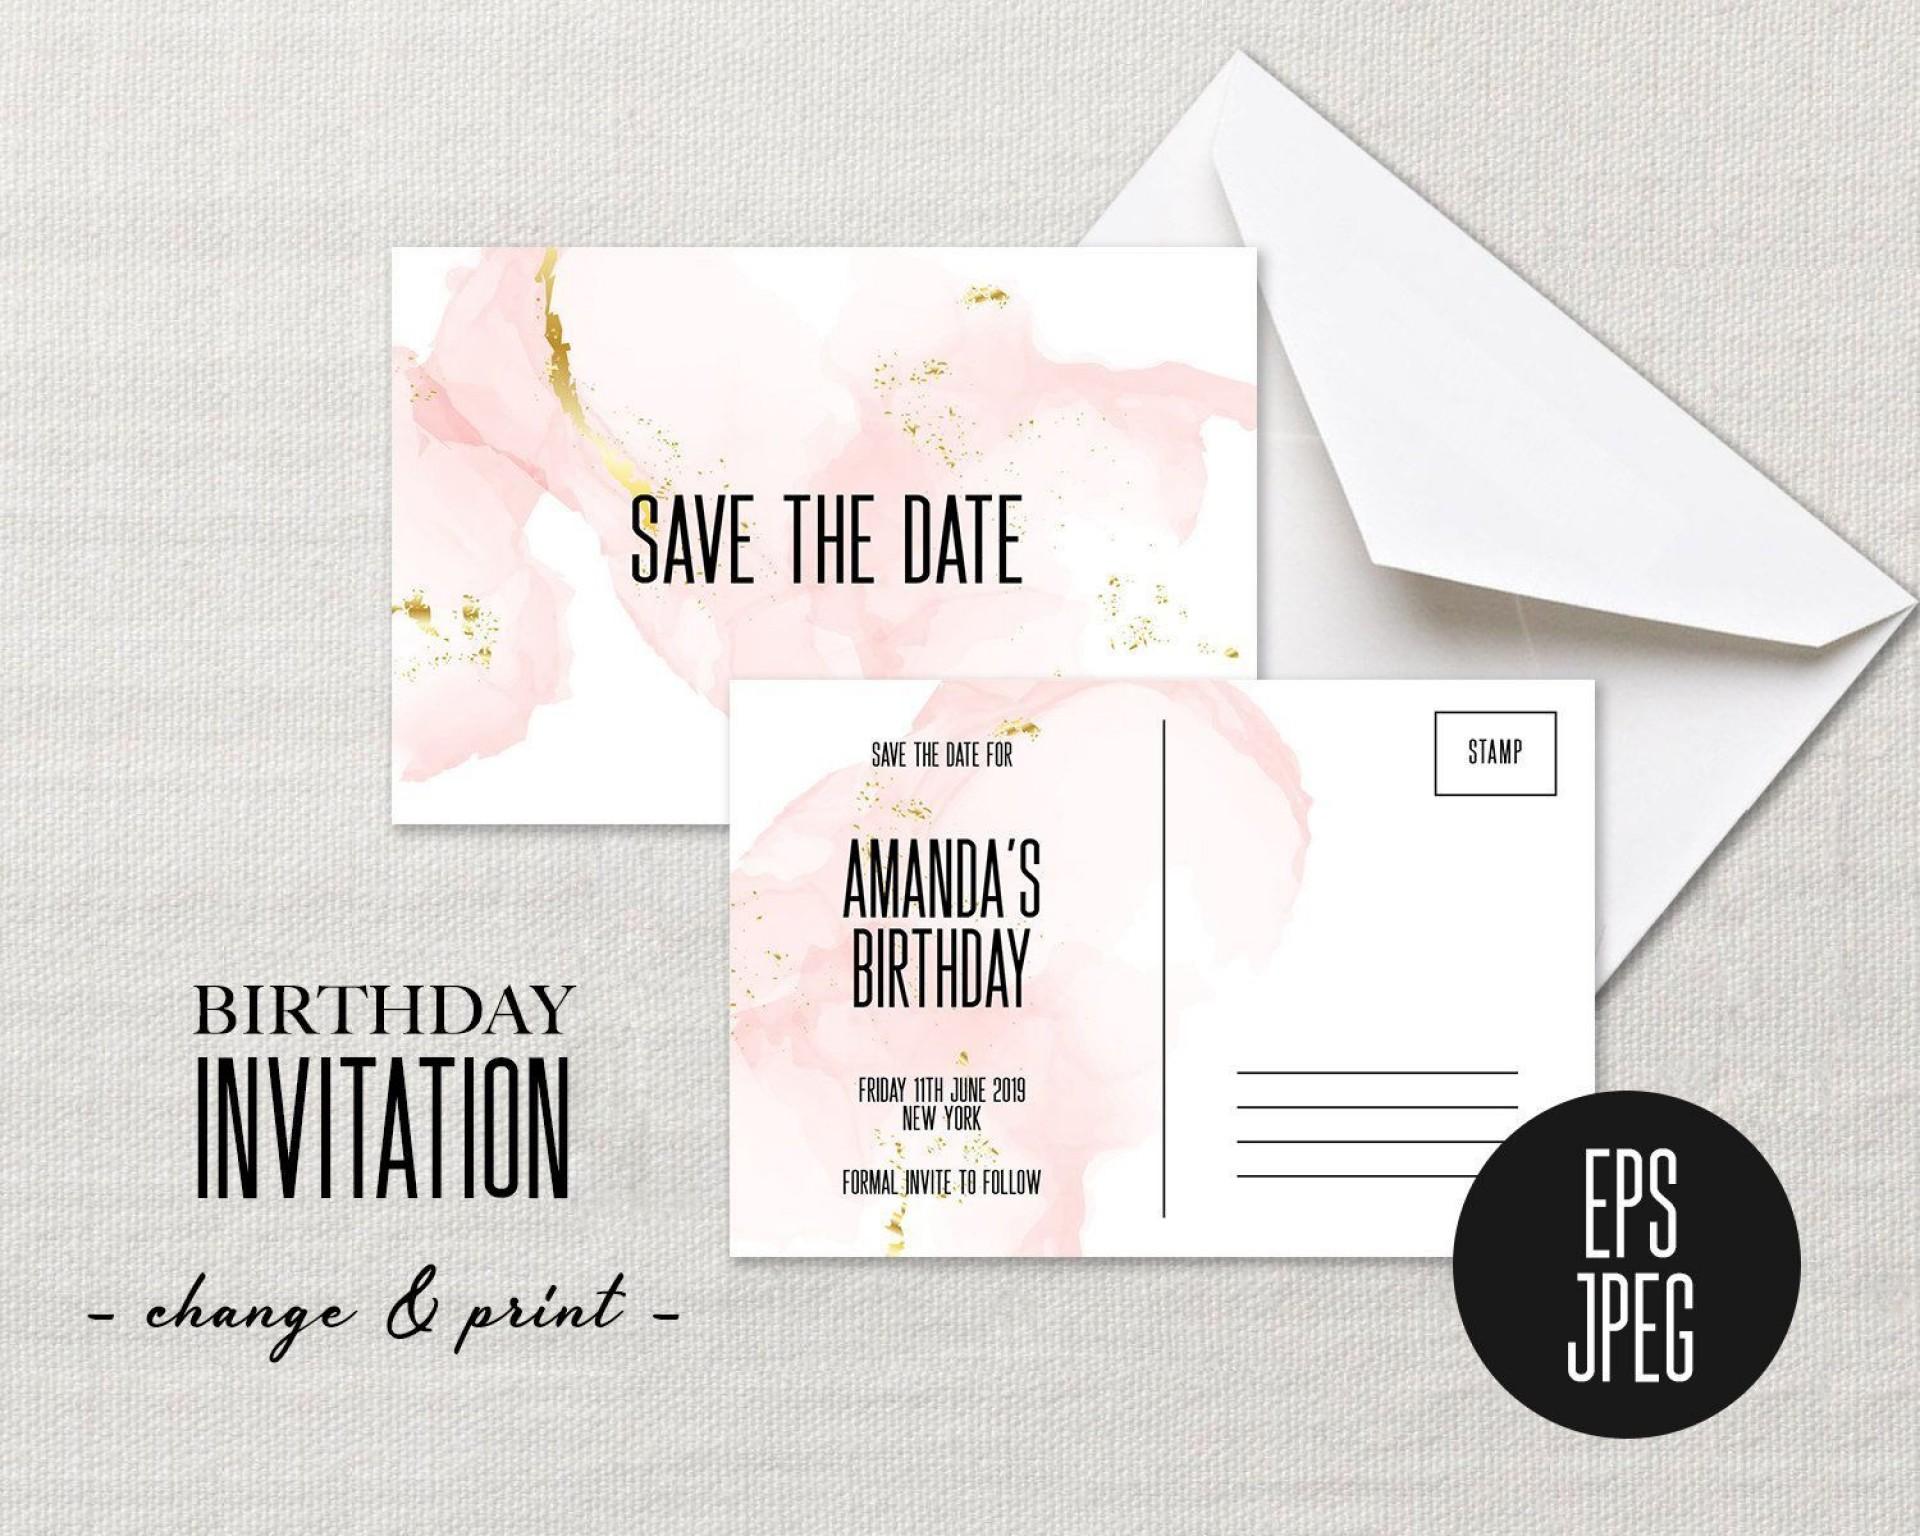 002 Striking Save The Date Birthday Card Template Image  Free Printable1920